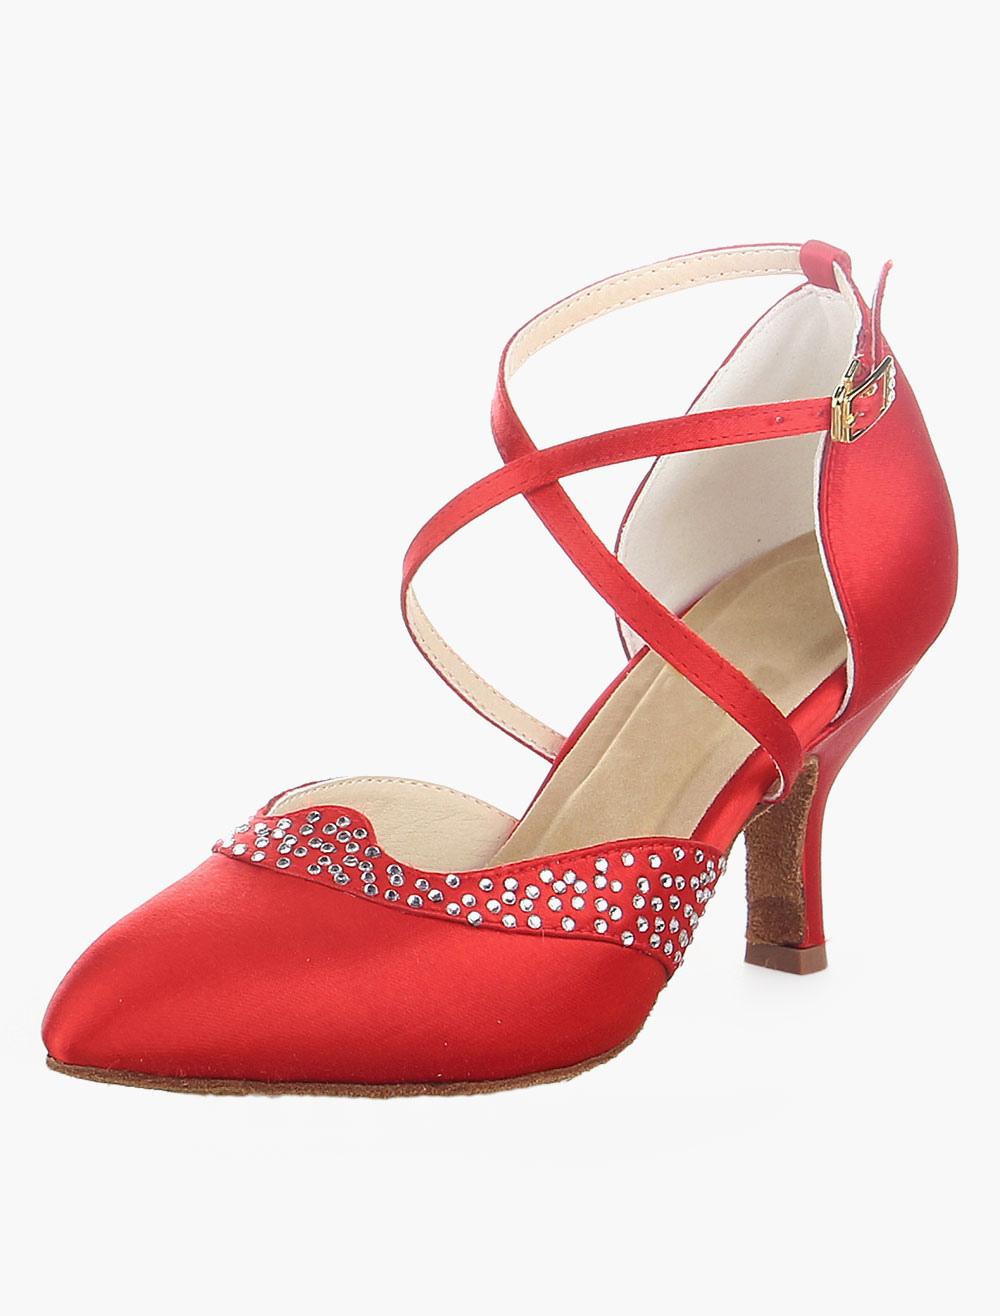 Red Rhinestone Pointed Toe Ballroom Shoes